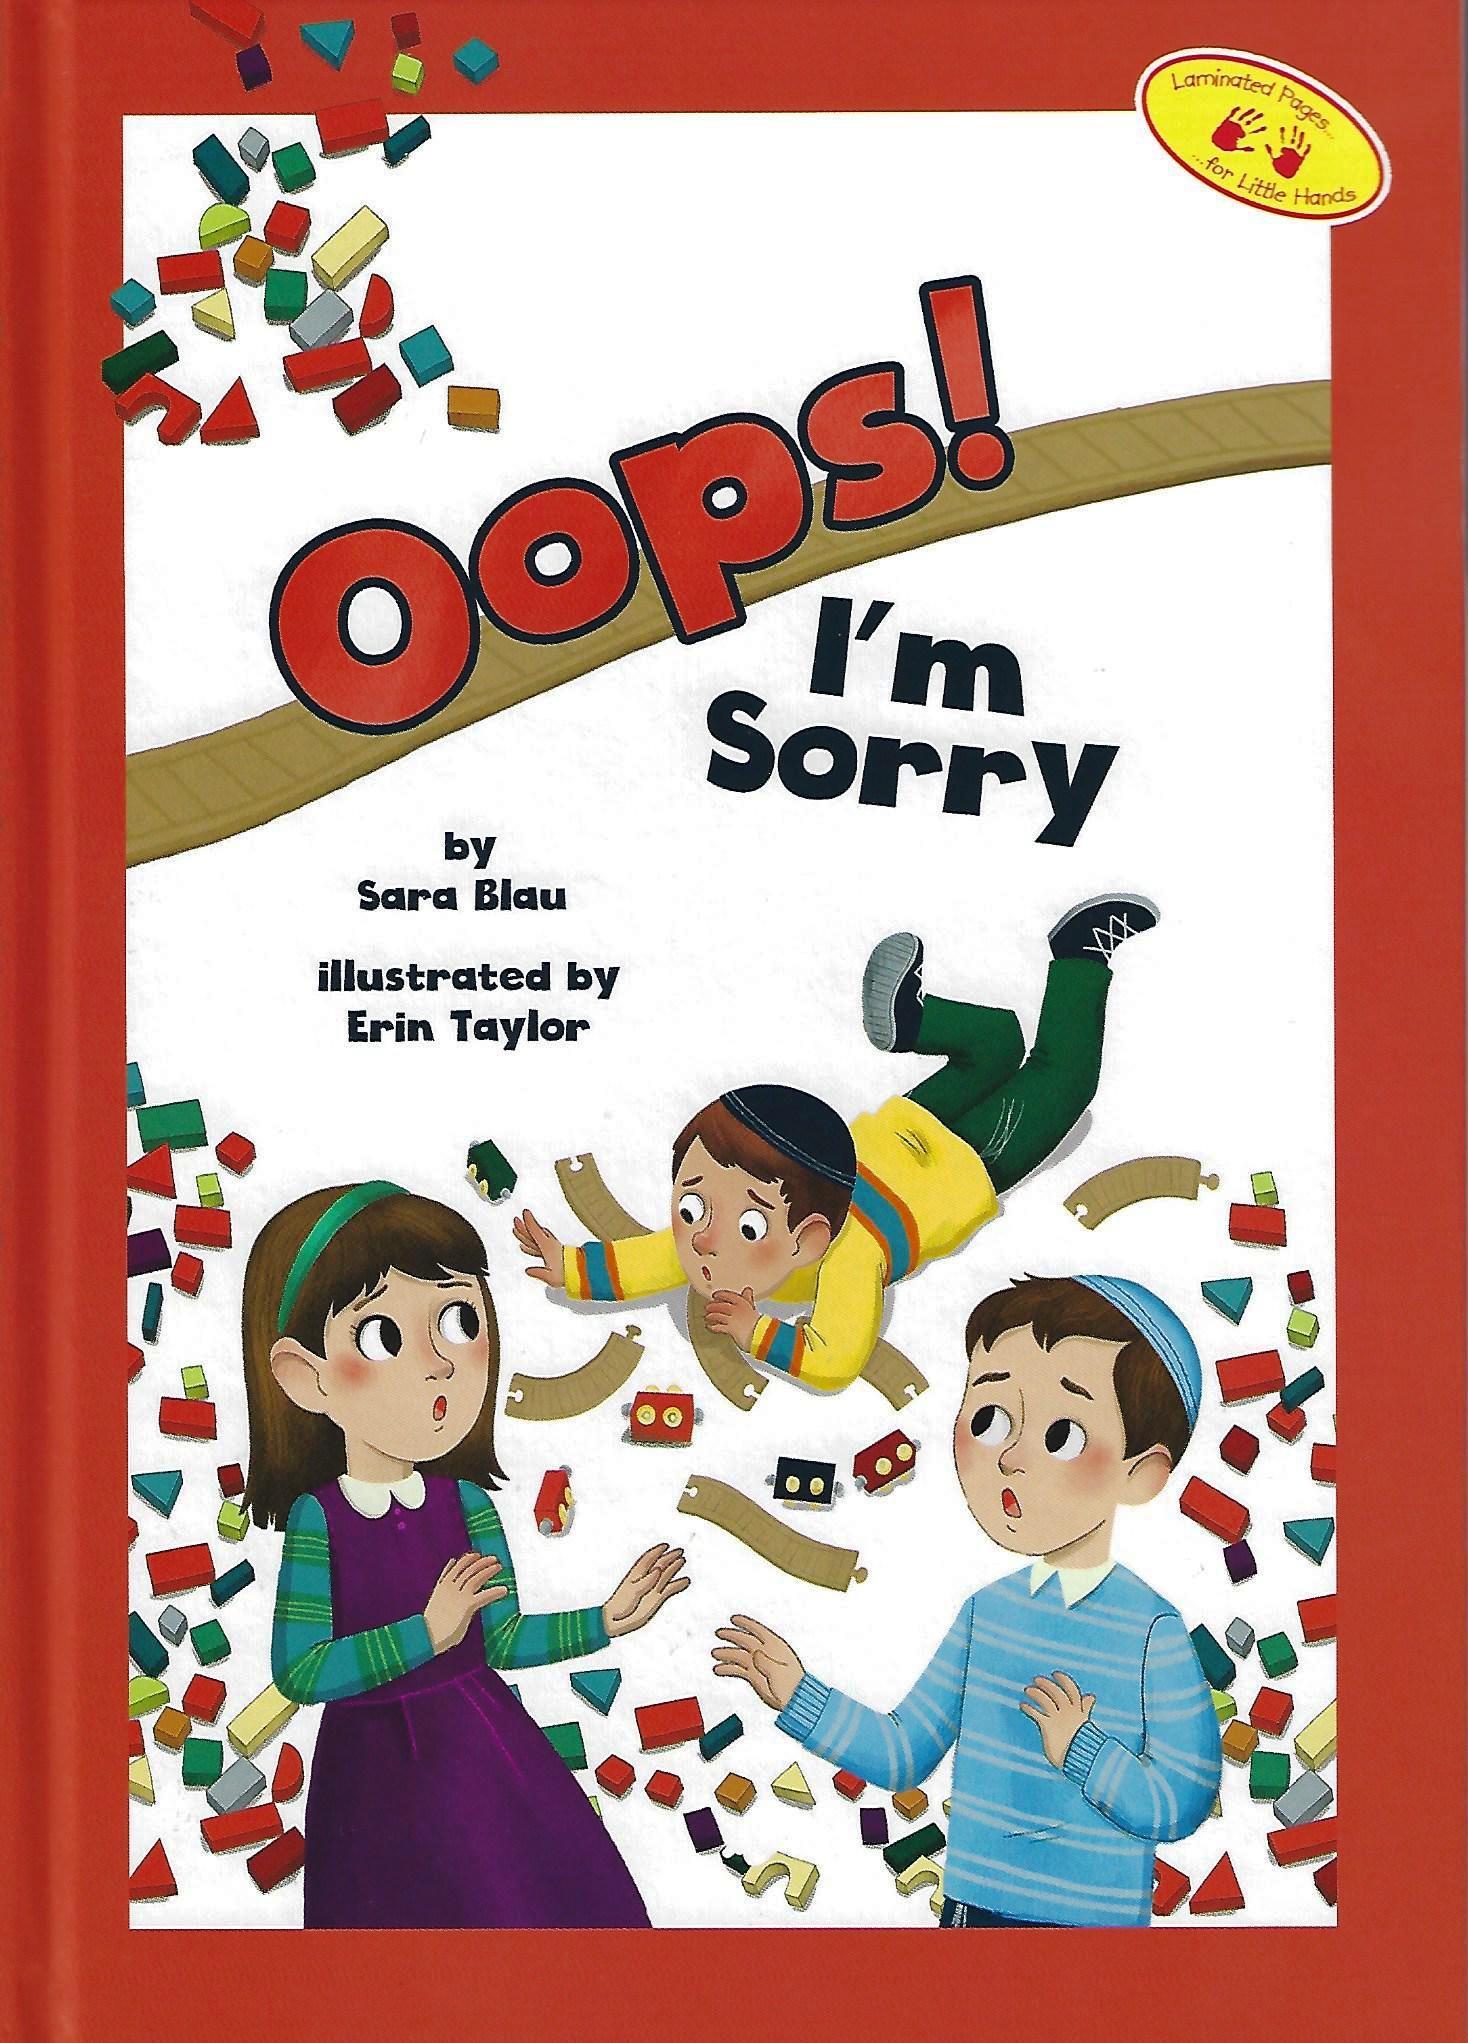 Oops! I'm Sorry.